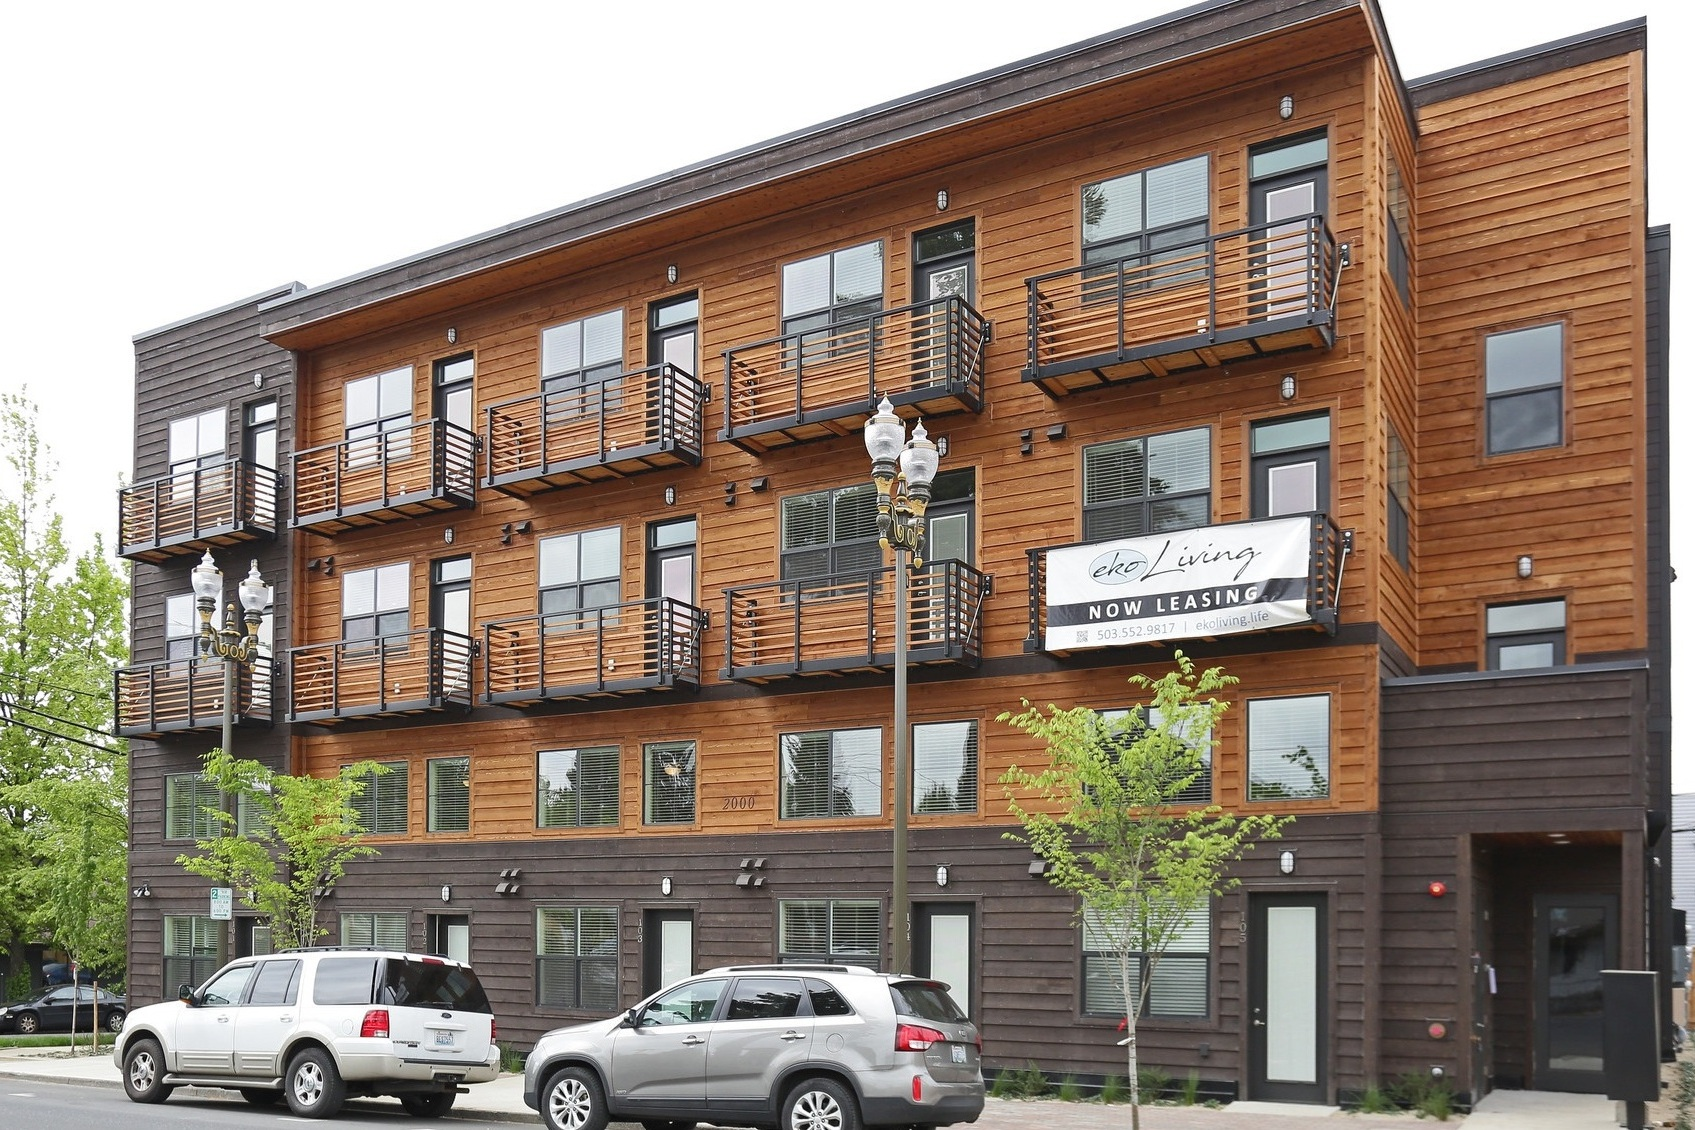 Hamilton - 2000 Broadway St. Vancouver, WA 98663Studios, Lofts